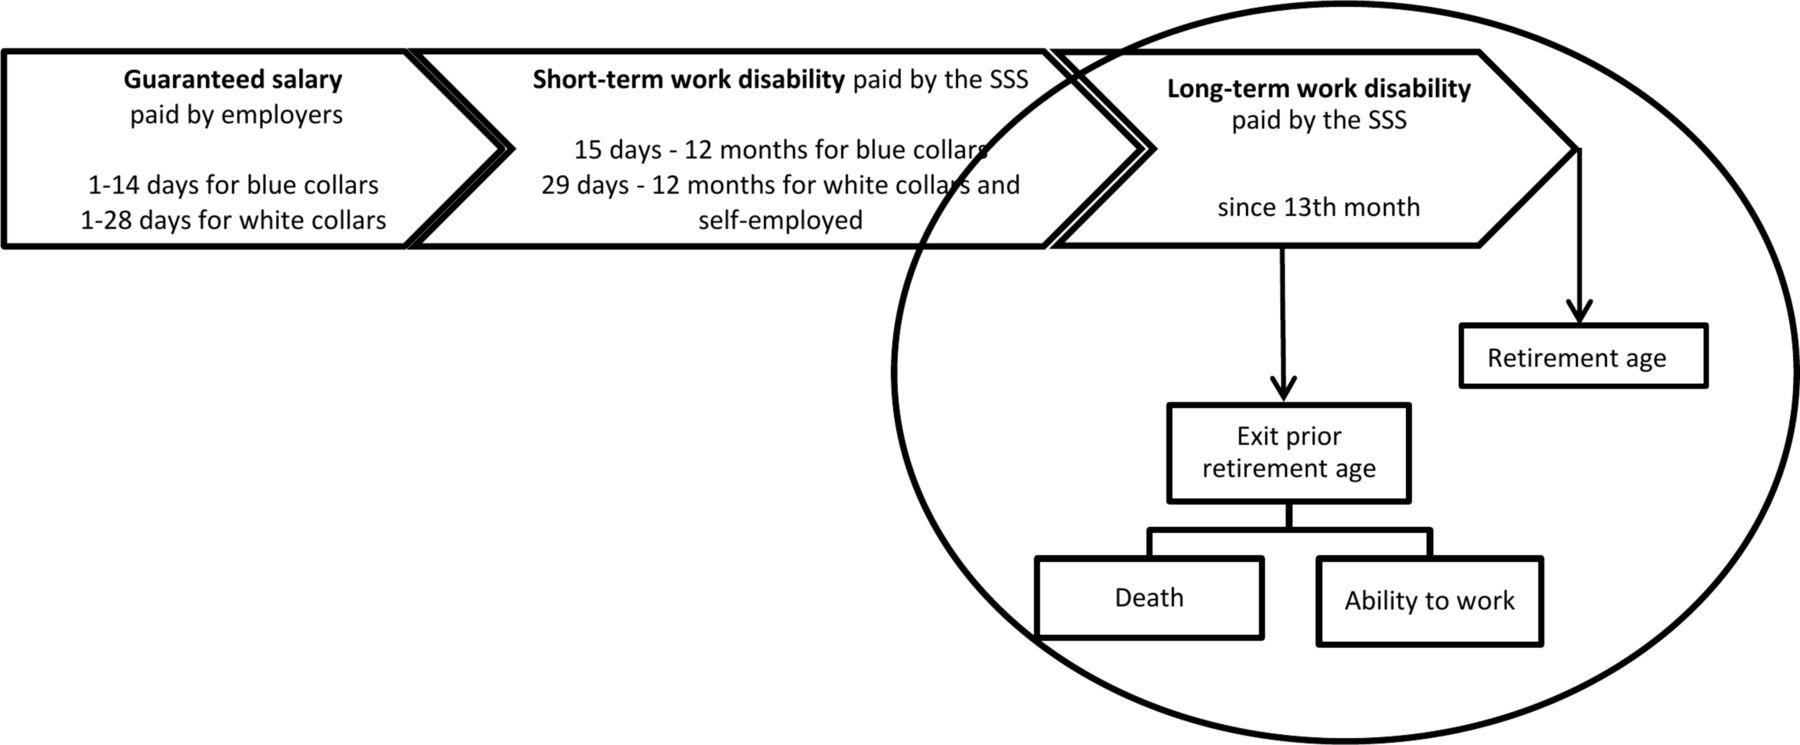 Assessing factors associated with long-term work